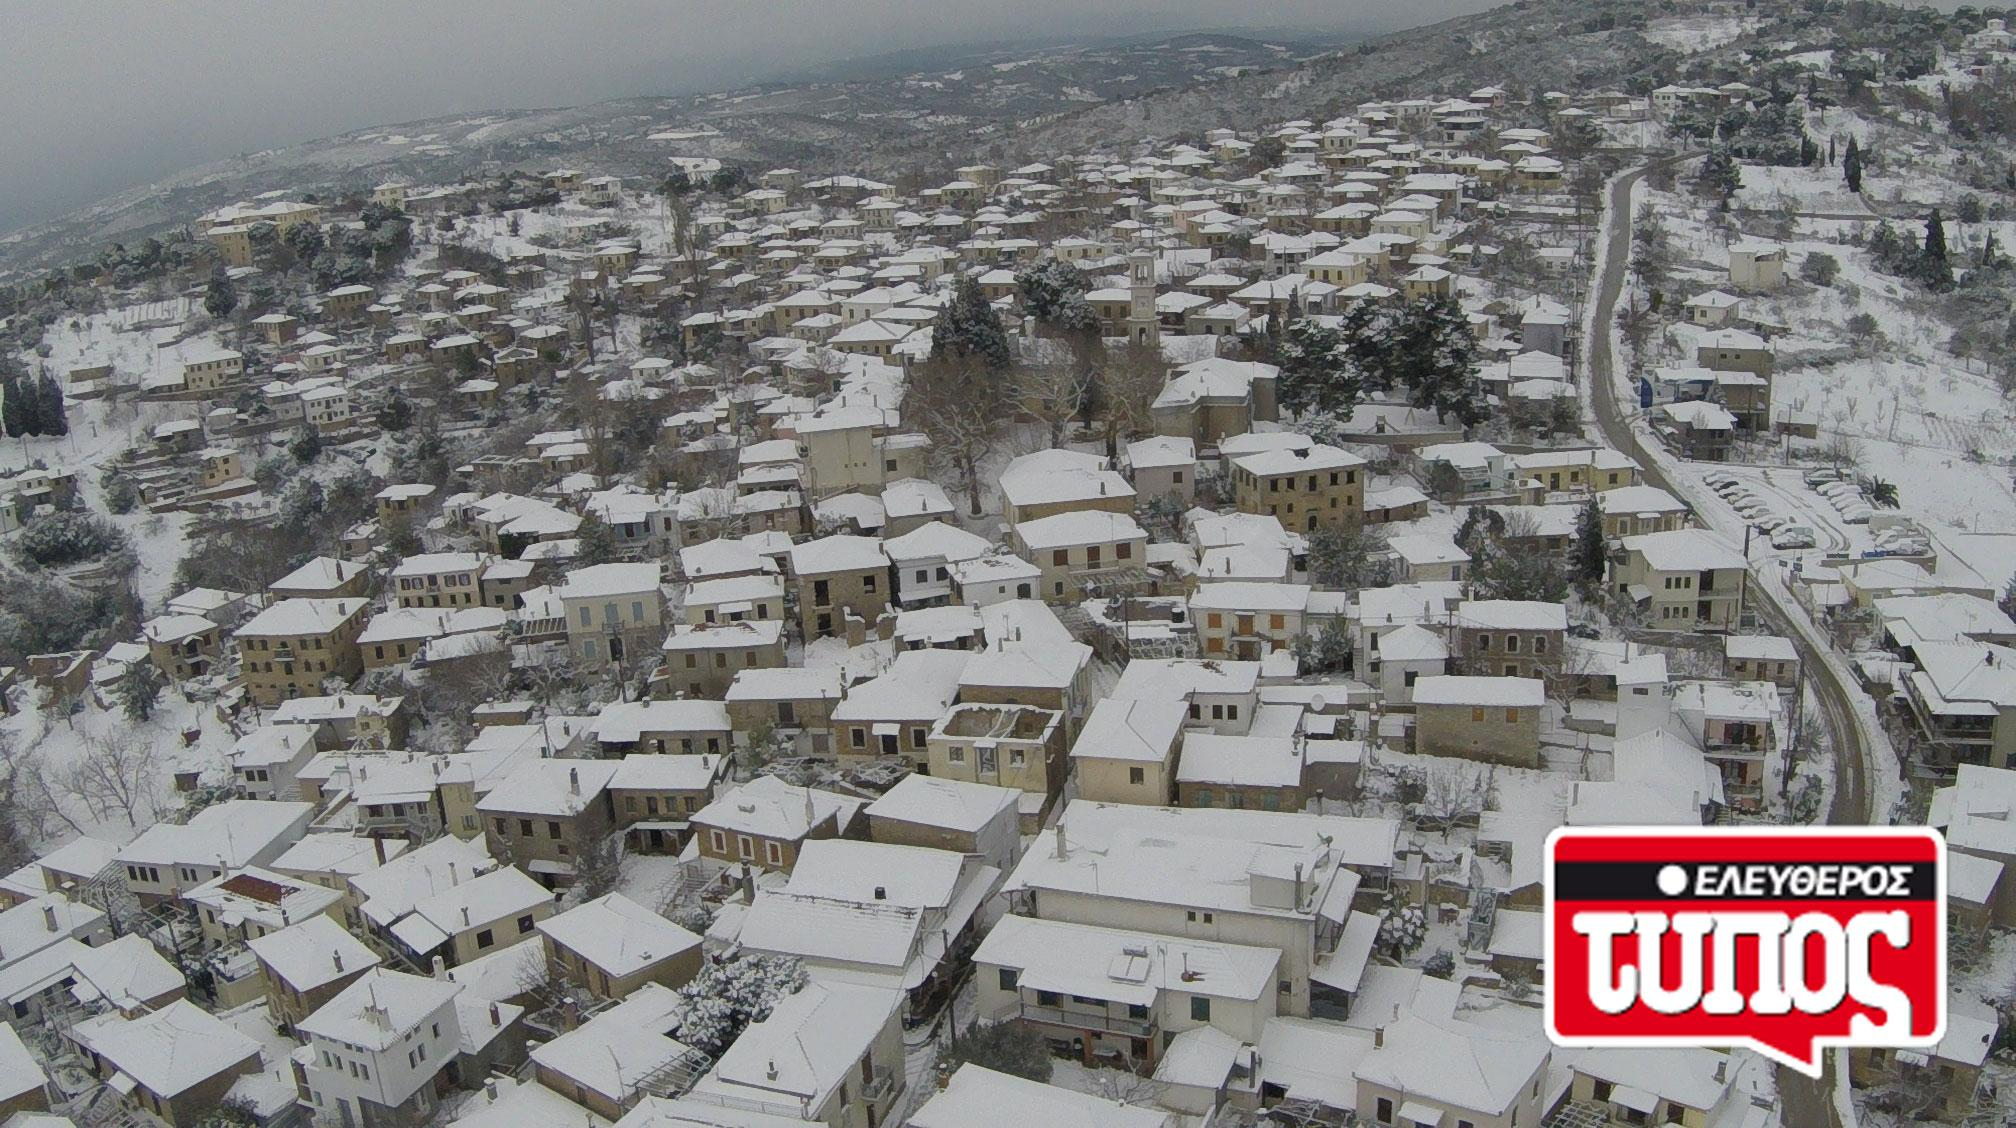 laukos-piliou-xionismenos-aerofotografies-1300-7 Εντυπωσιακές αεροφωτογραφίες από το χιονισμένο Λαύκο Πηλίου [εικόνες]